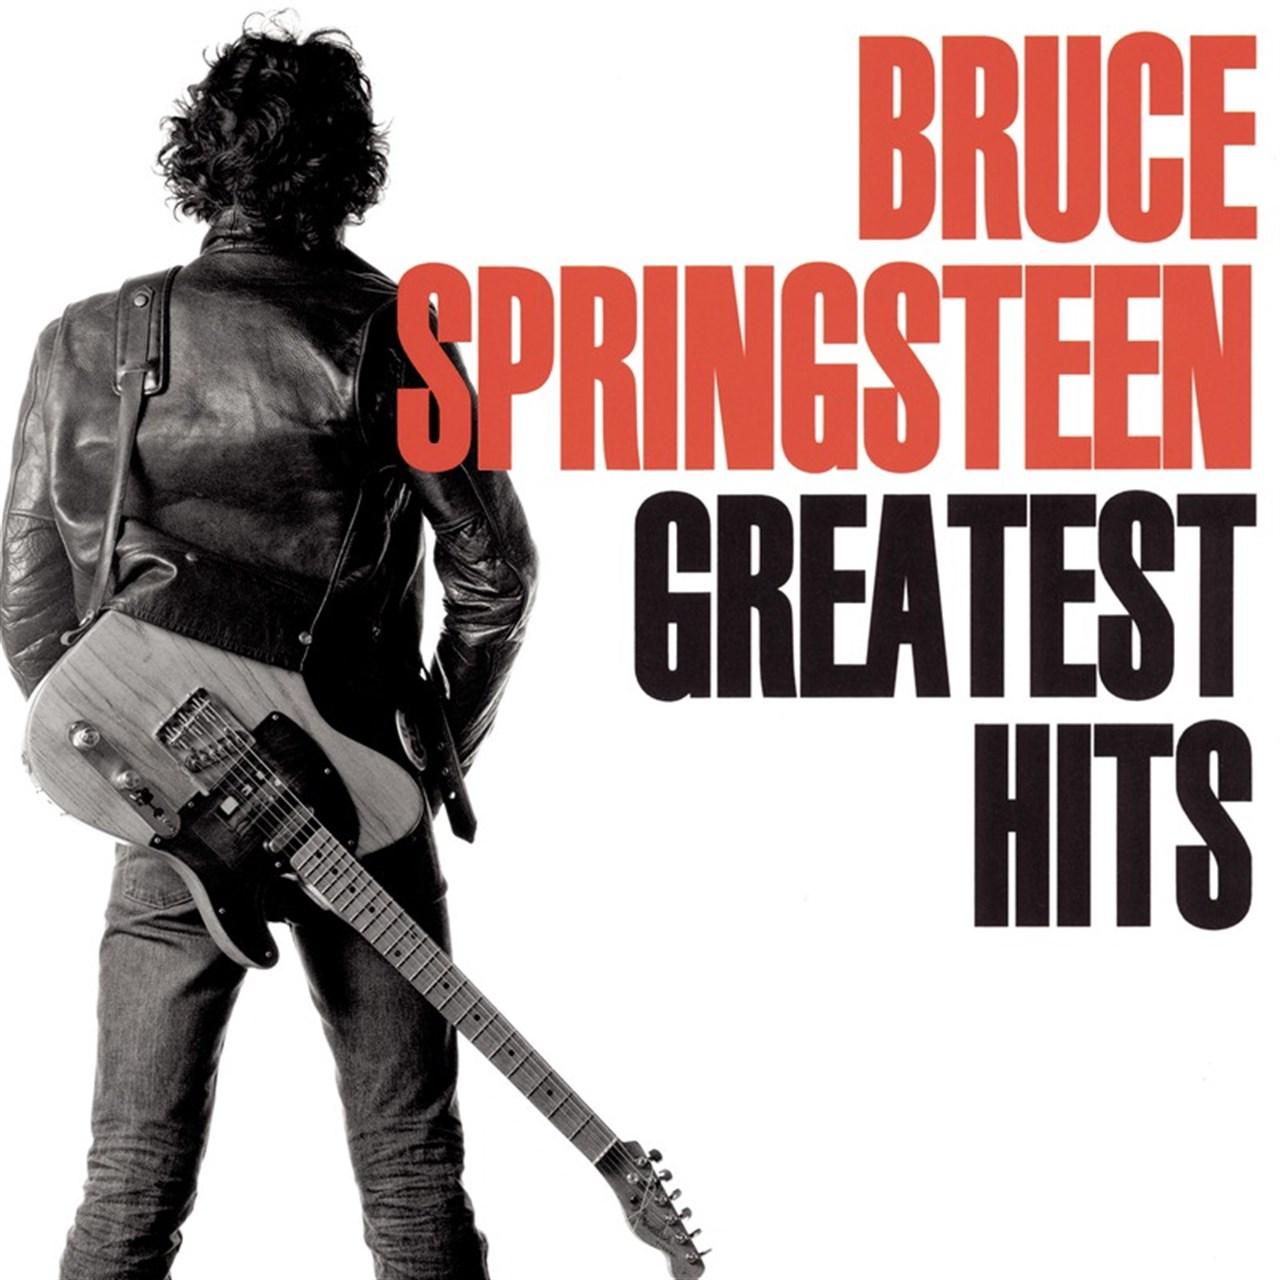 Bruce Springsteen Bruce Springsteen - Greatest Hits (2 Lp, Colour) bruce springsteen bruce springsteen greatest hits 2 lp